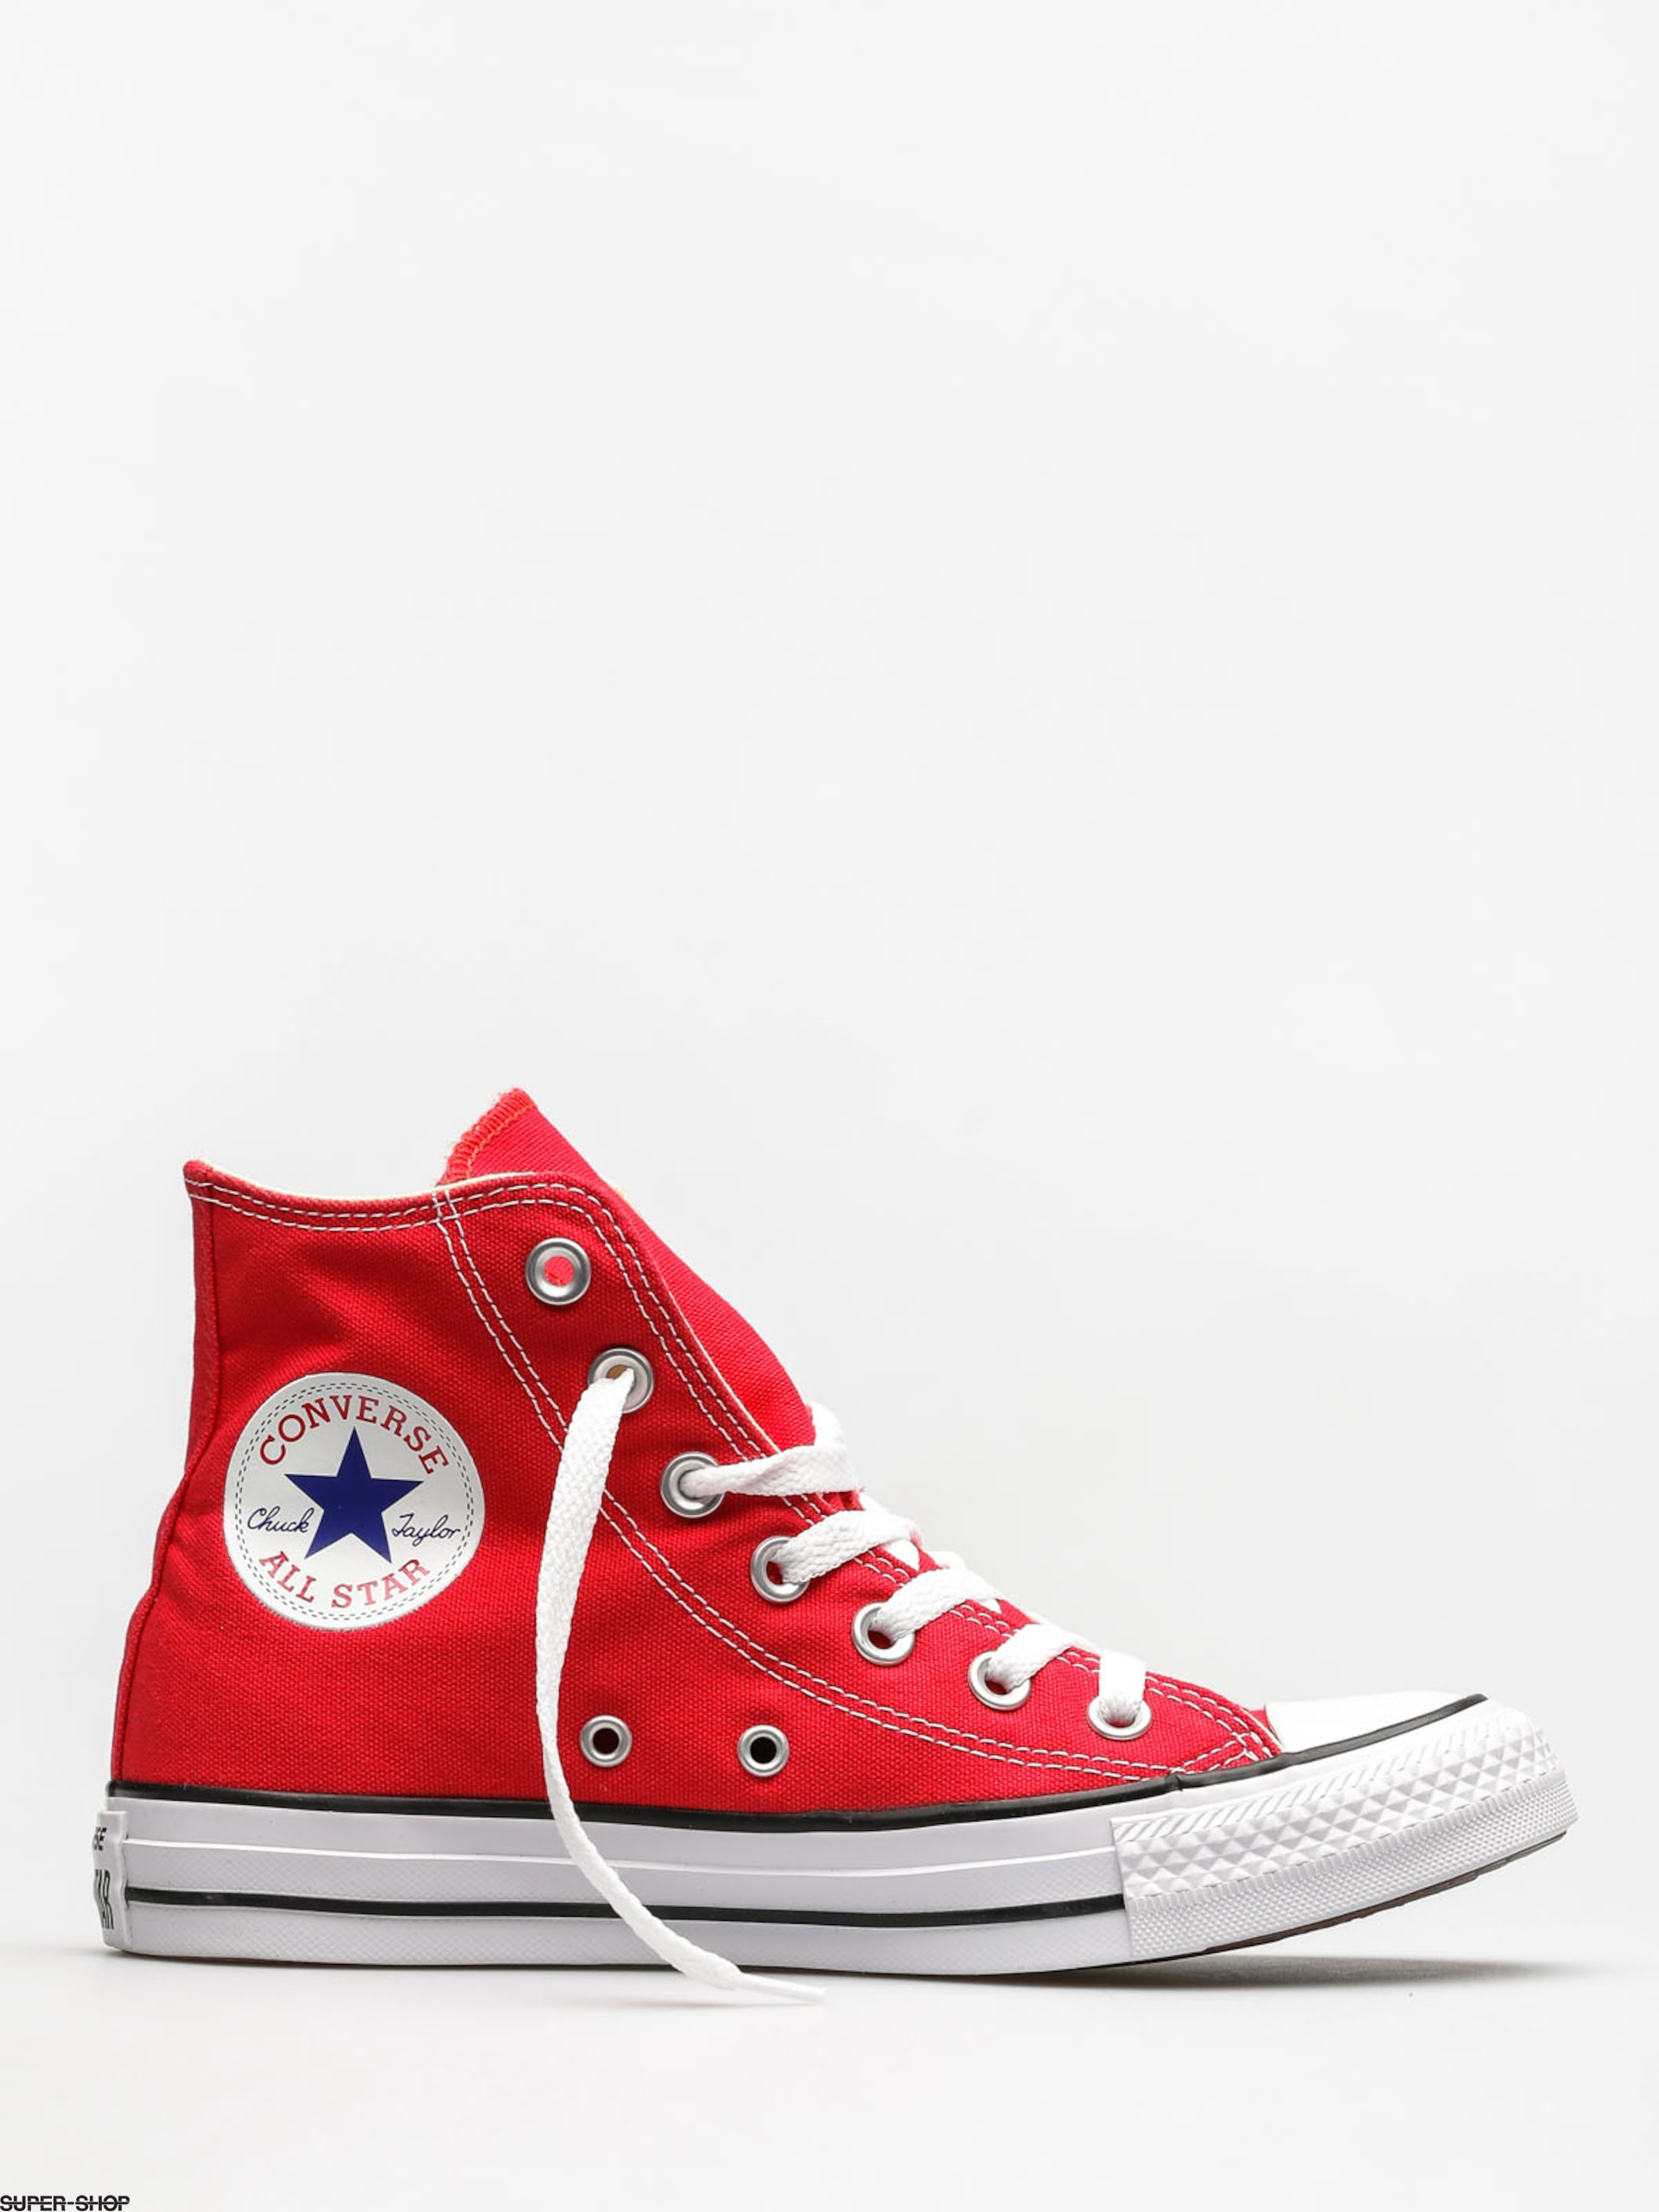 Converse Chucks Chuck Taylor All Star